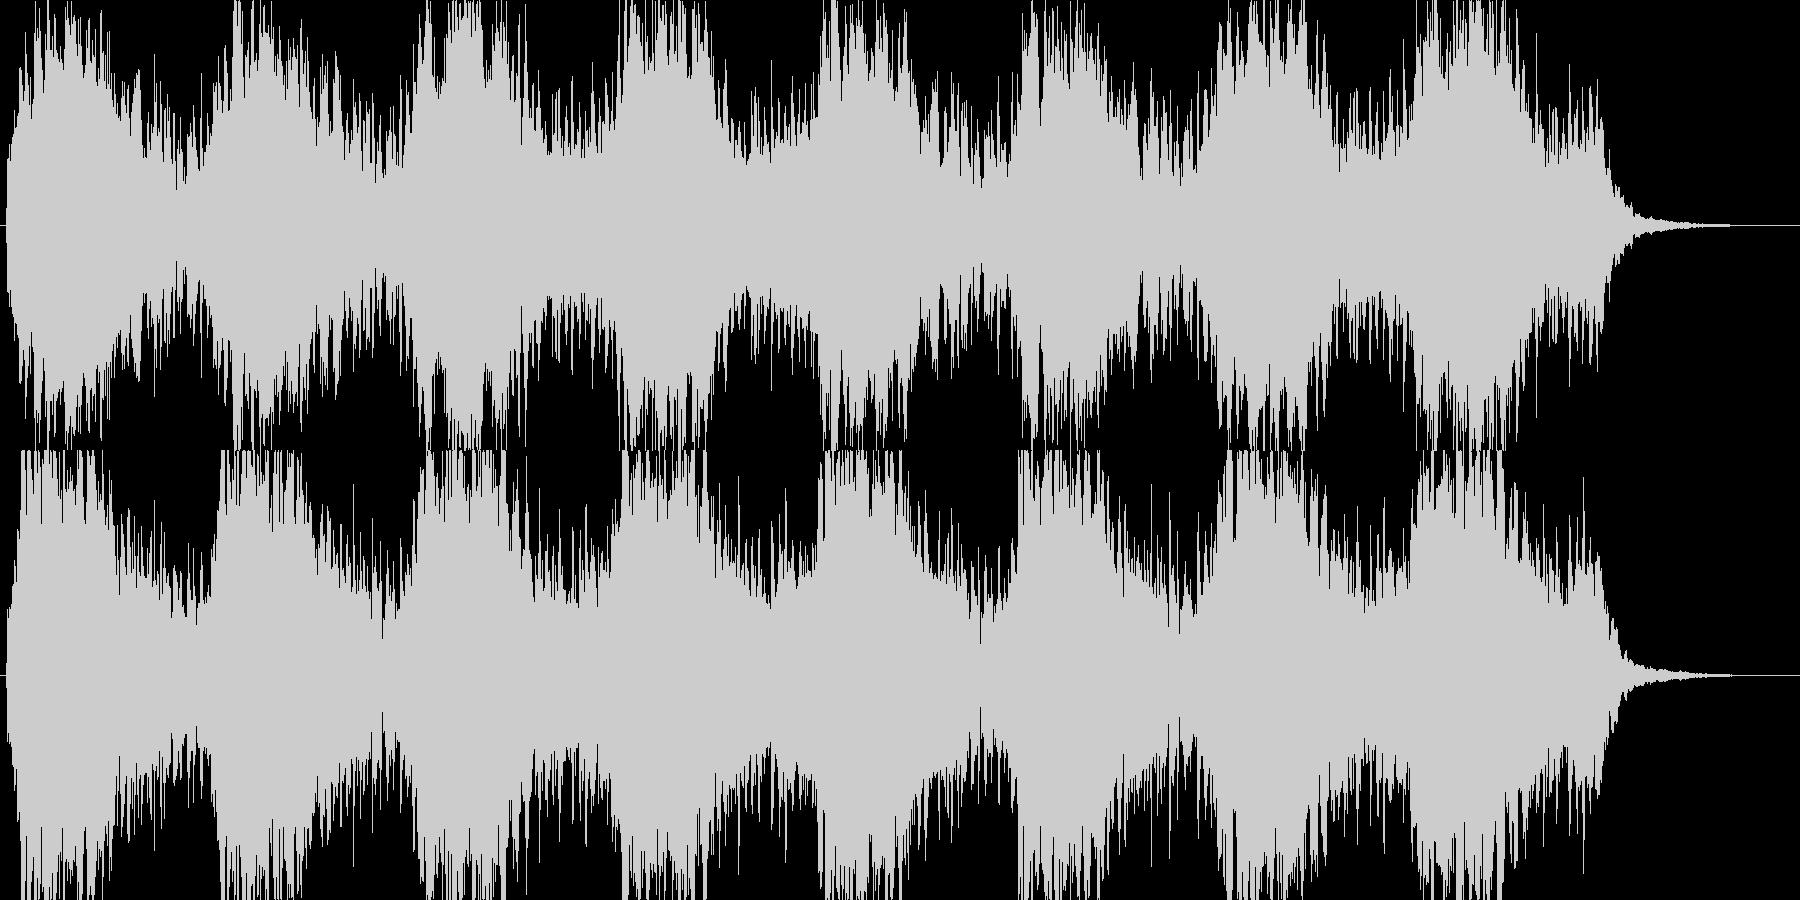 no.2「水」「水のある風景」 B8の未再生の波形